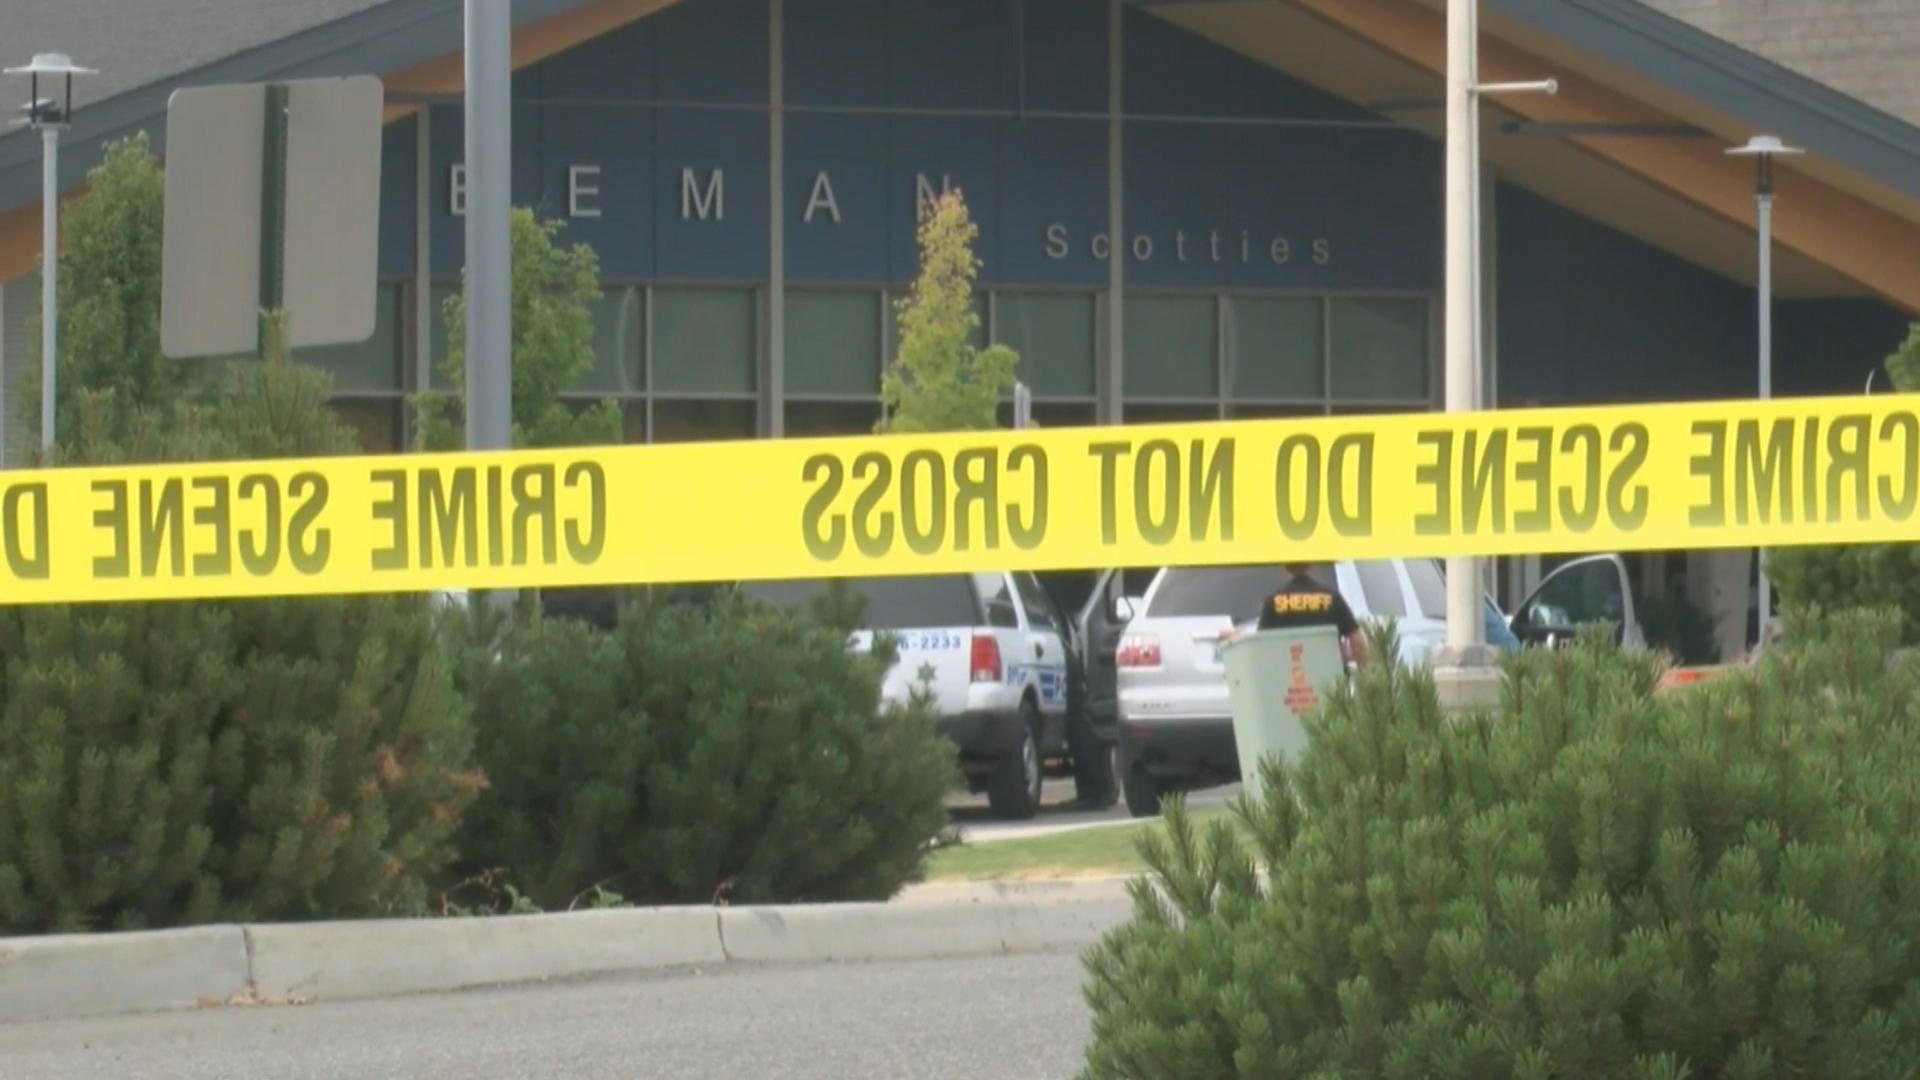 Cops: Ammo, manifesto seized in school shooting suspect's home